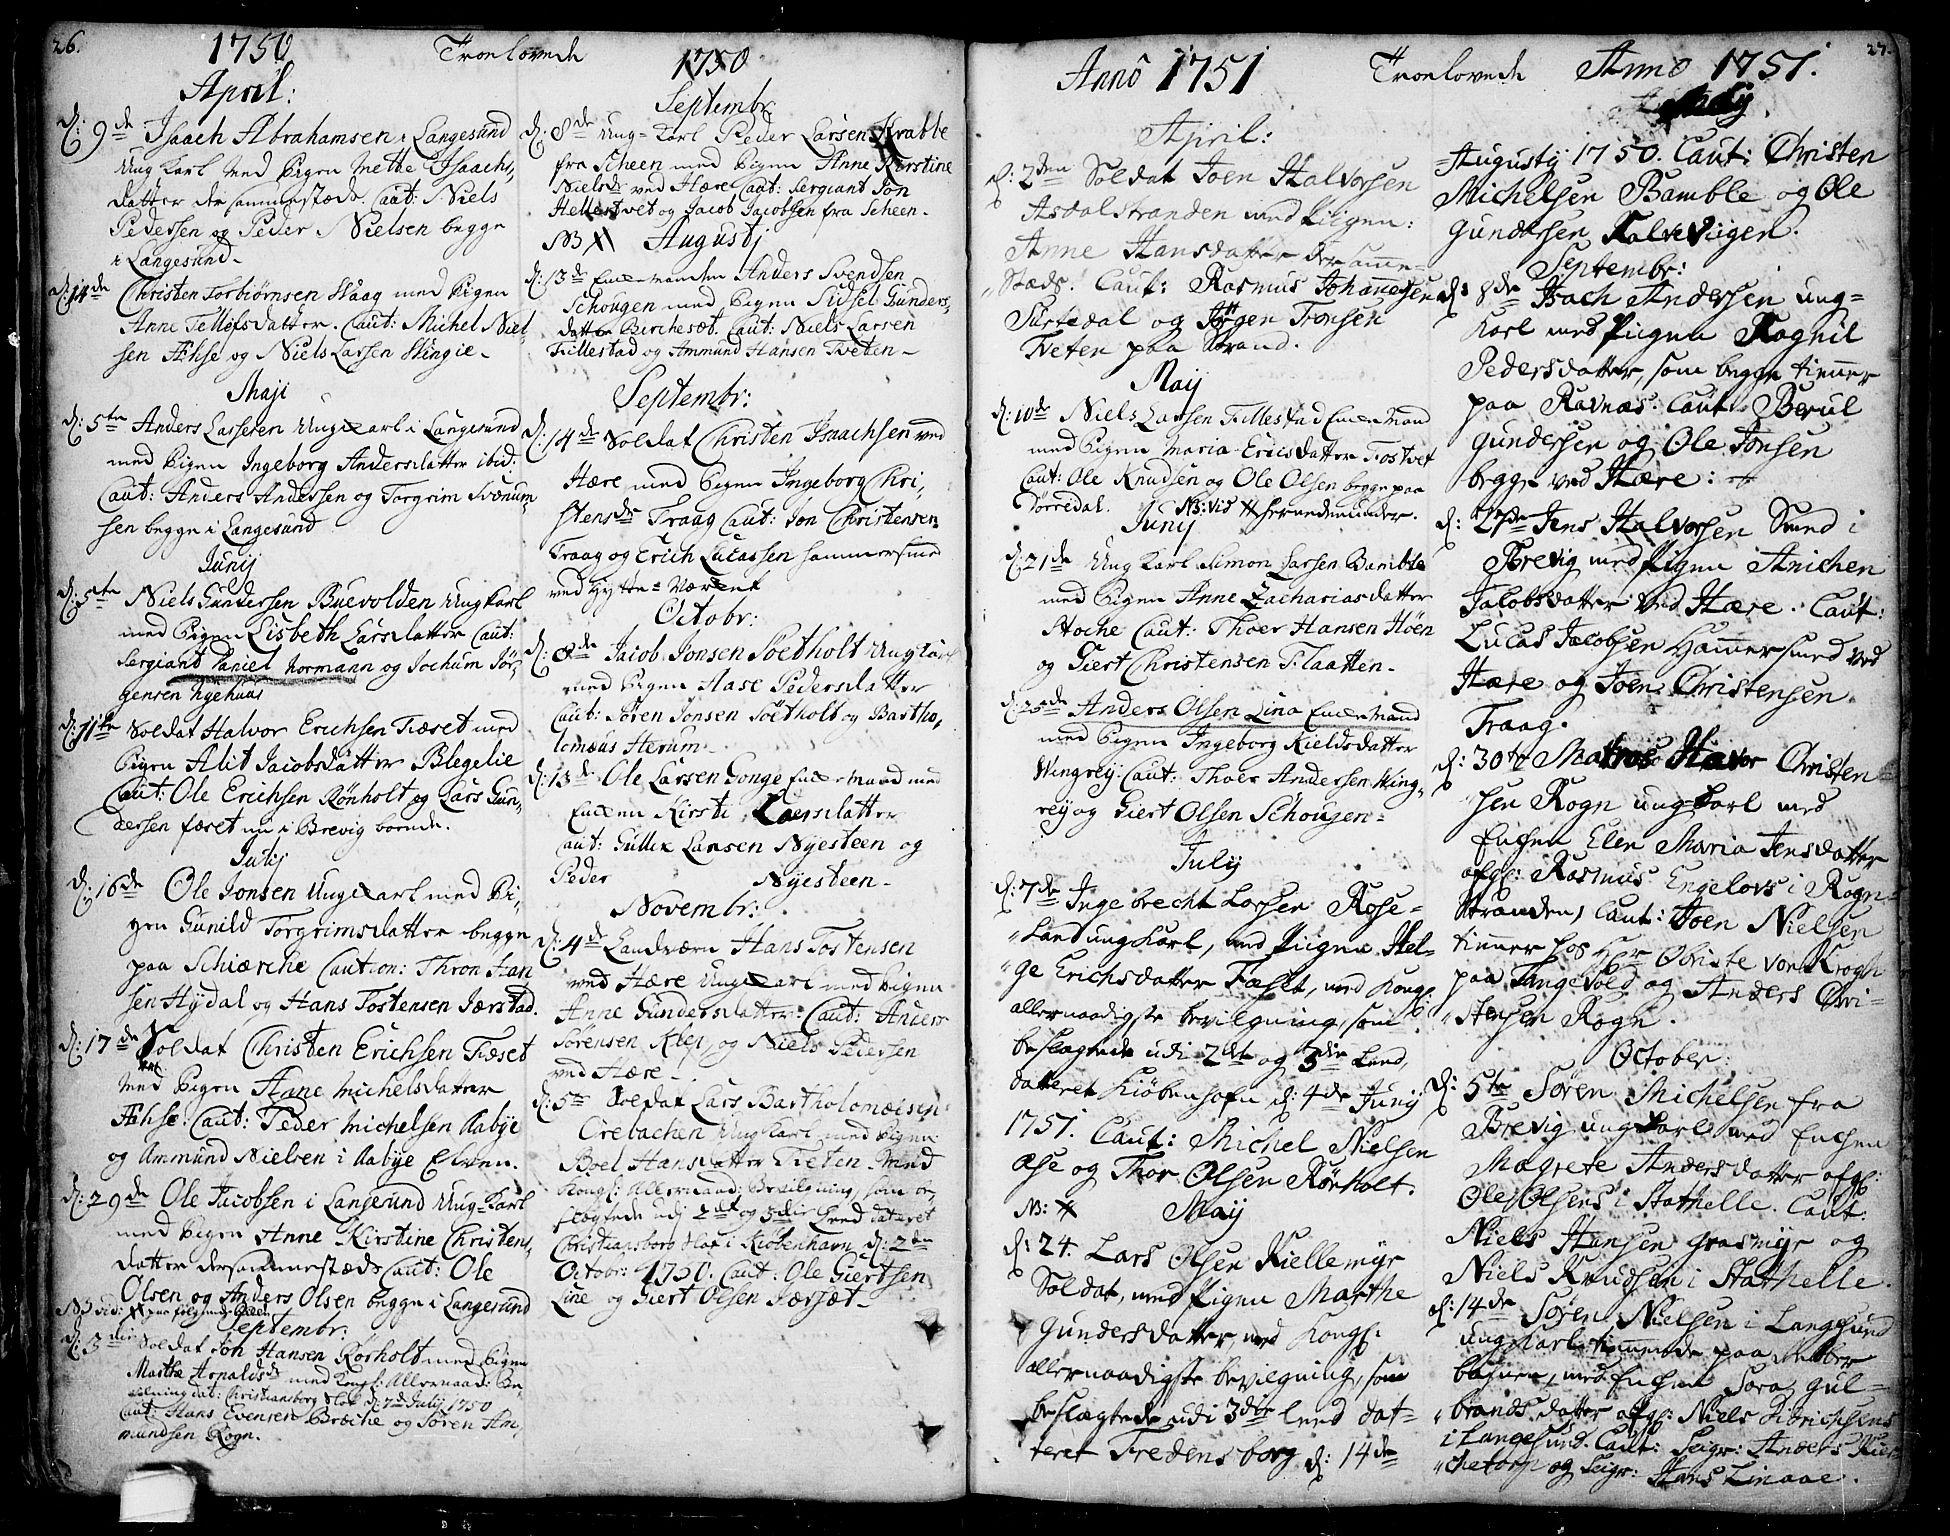 SAKO, Bamble kirkebøker, F/Fa/L0001: Ministerialbok nr. I 1, 1702-1774, s. 26-27